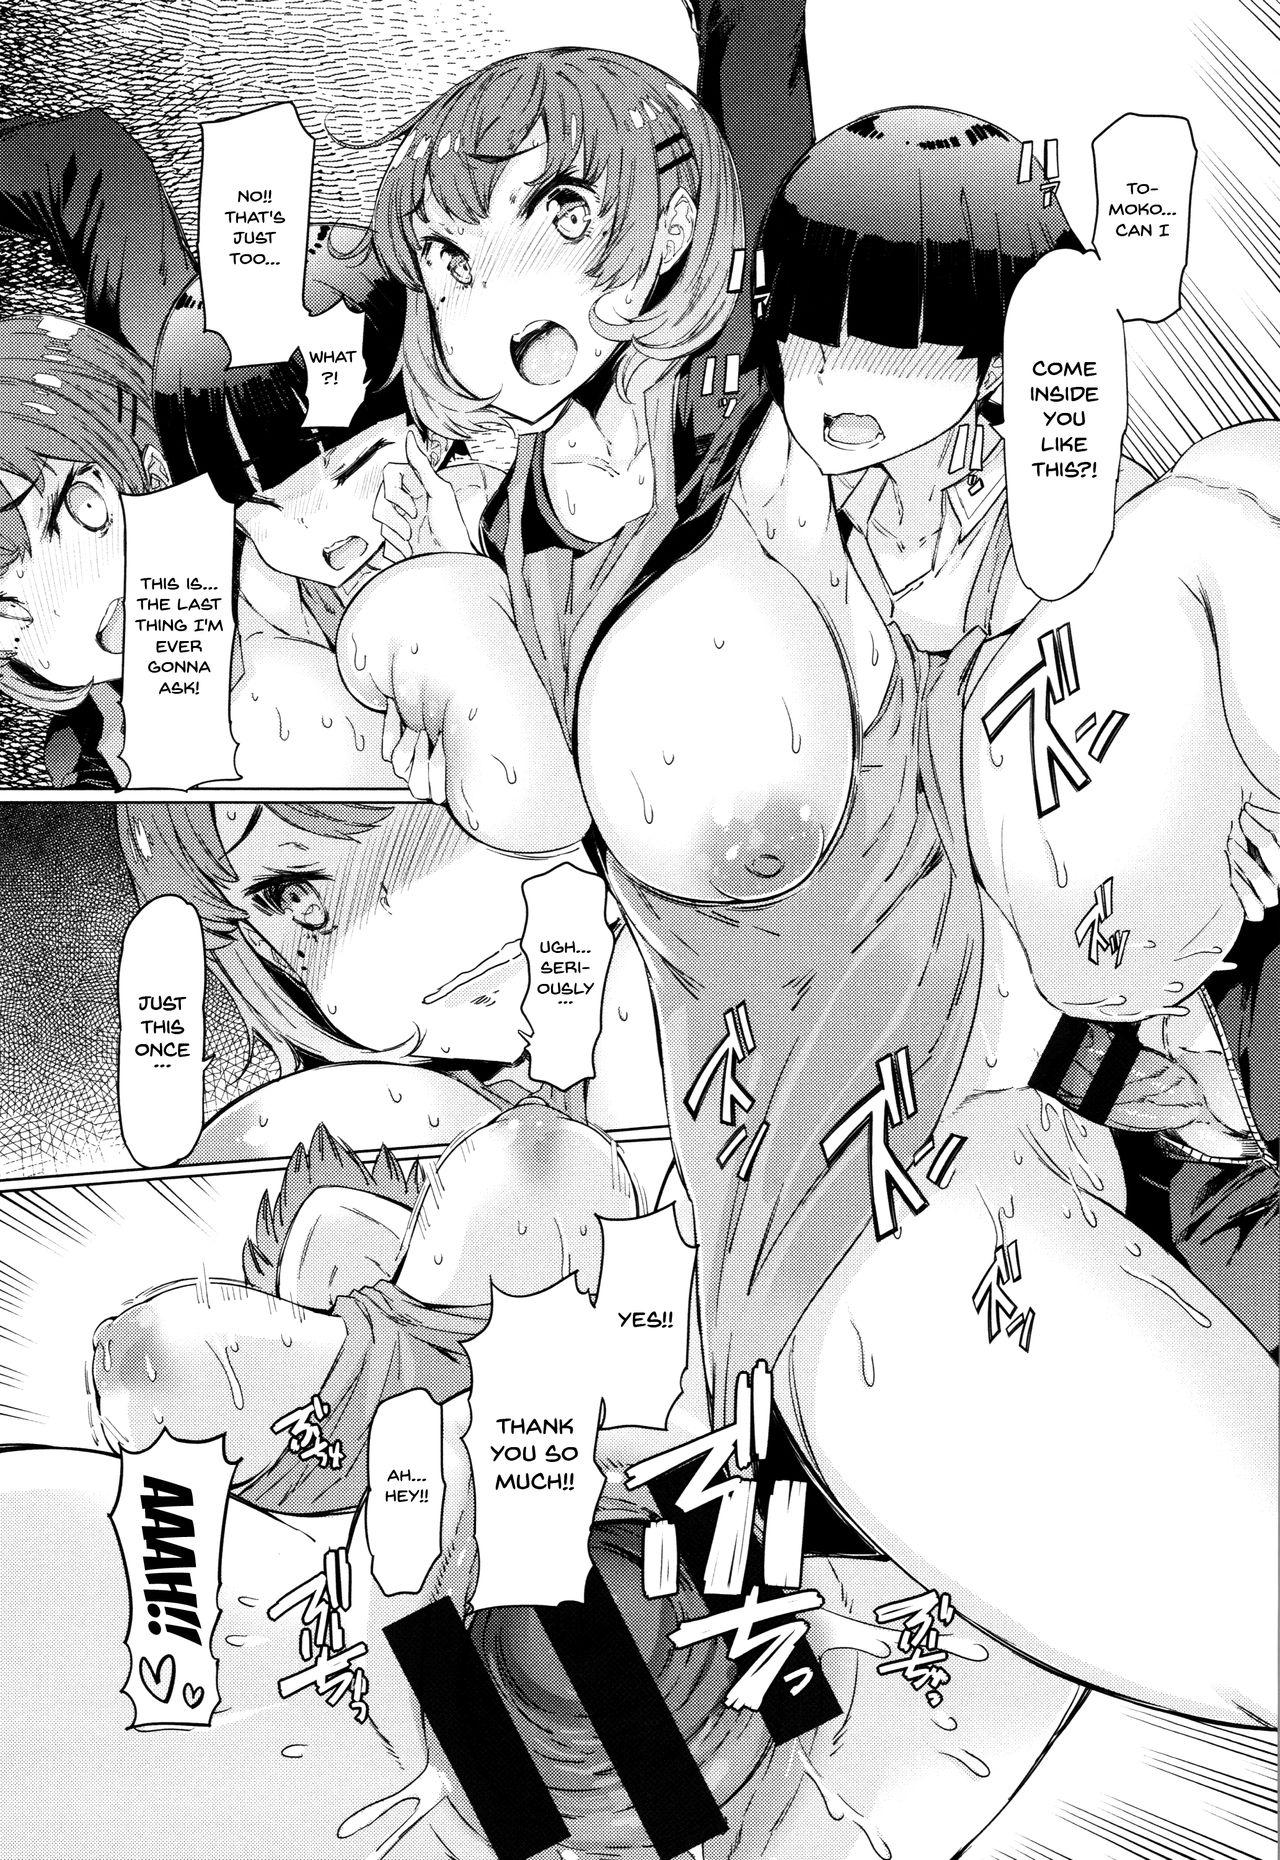 Hitozuma ga Ero Sugite Shigoto ni Naranai!   These Housewives Are Too Lewd I Can't Help It! 146